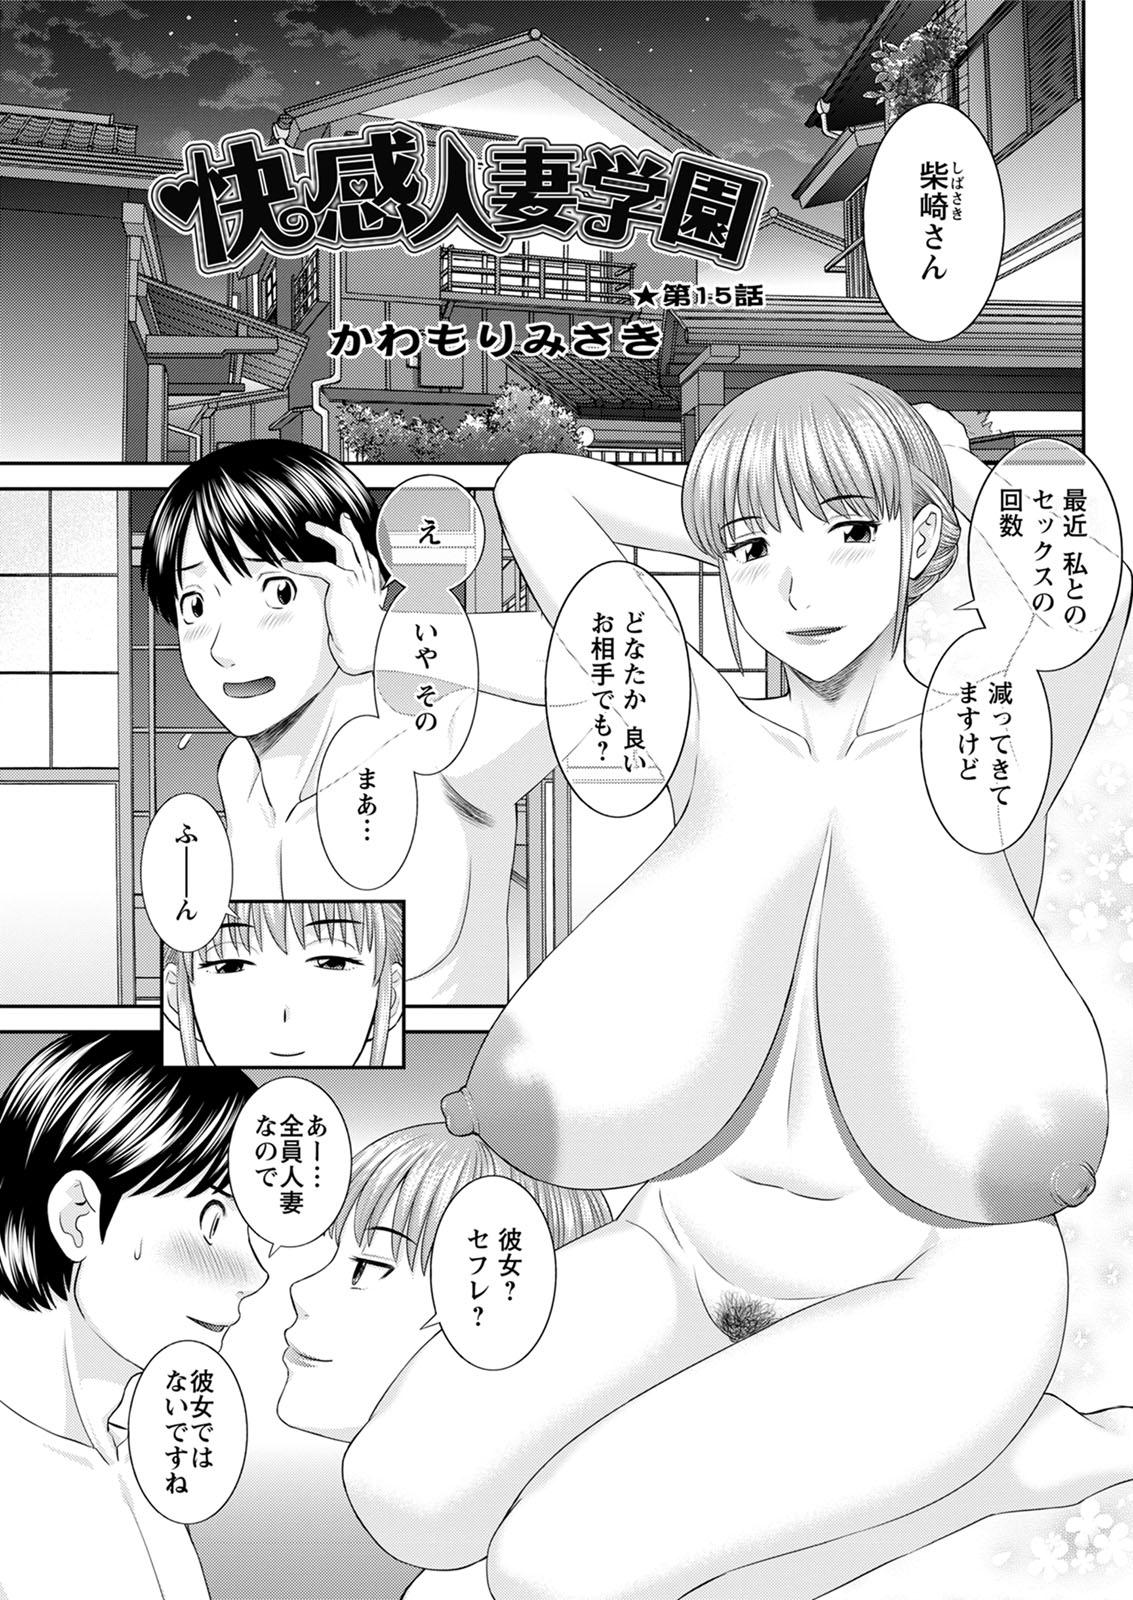 [Kawamori Misaki] Kaikan Hitotsuma Gakuen Ch. 1-6, 8-16 [Digital] 239